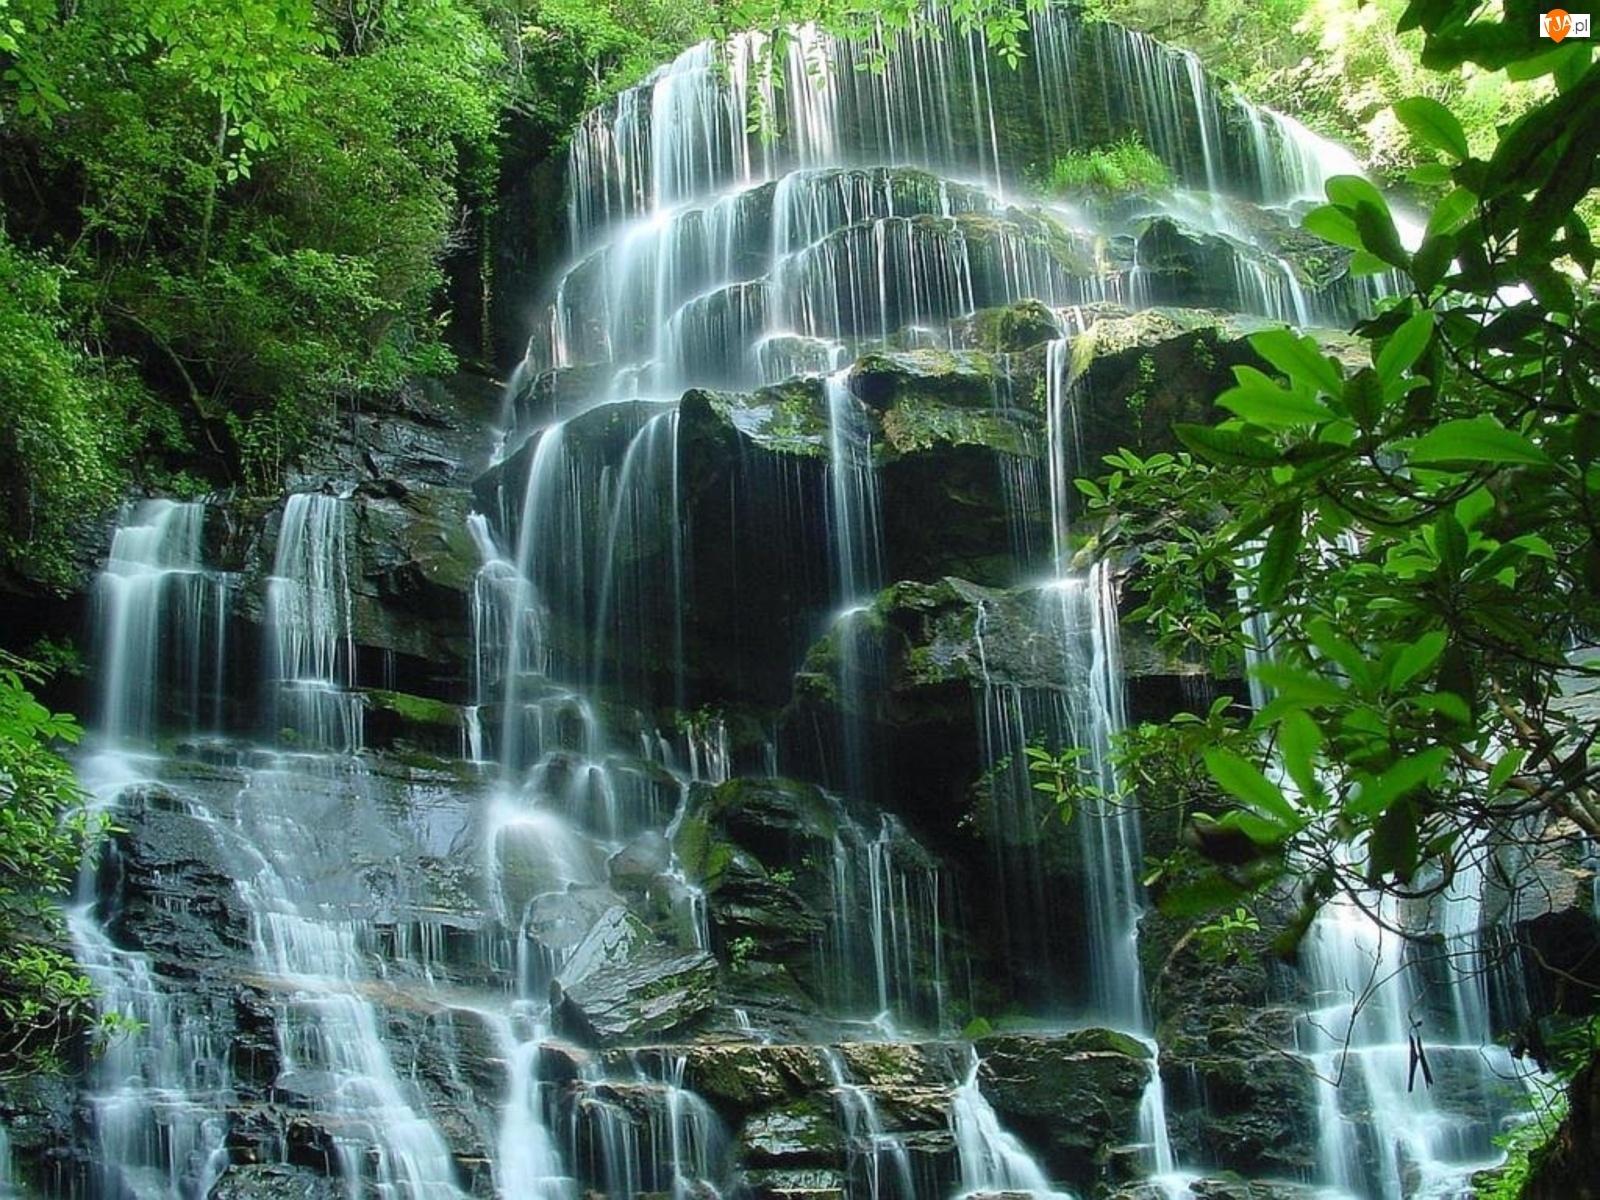 виды картинки на телефон водопады движущиеся море это симбиоз караоке